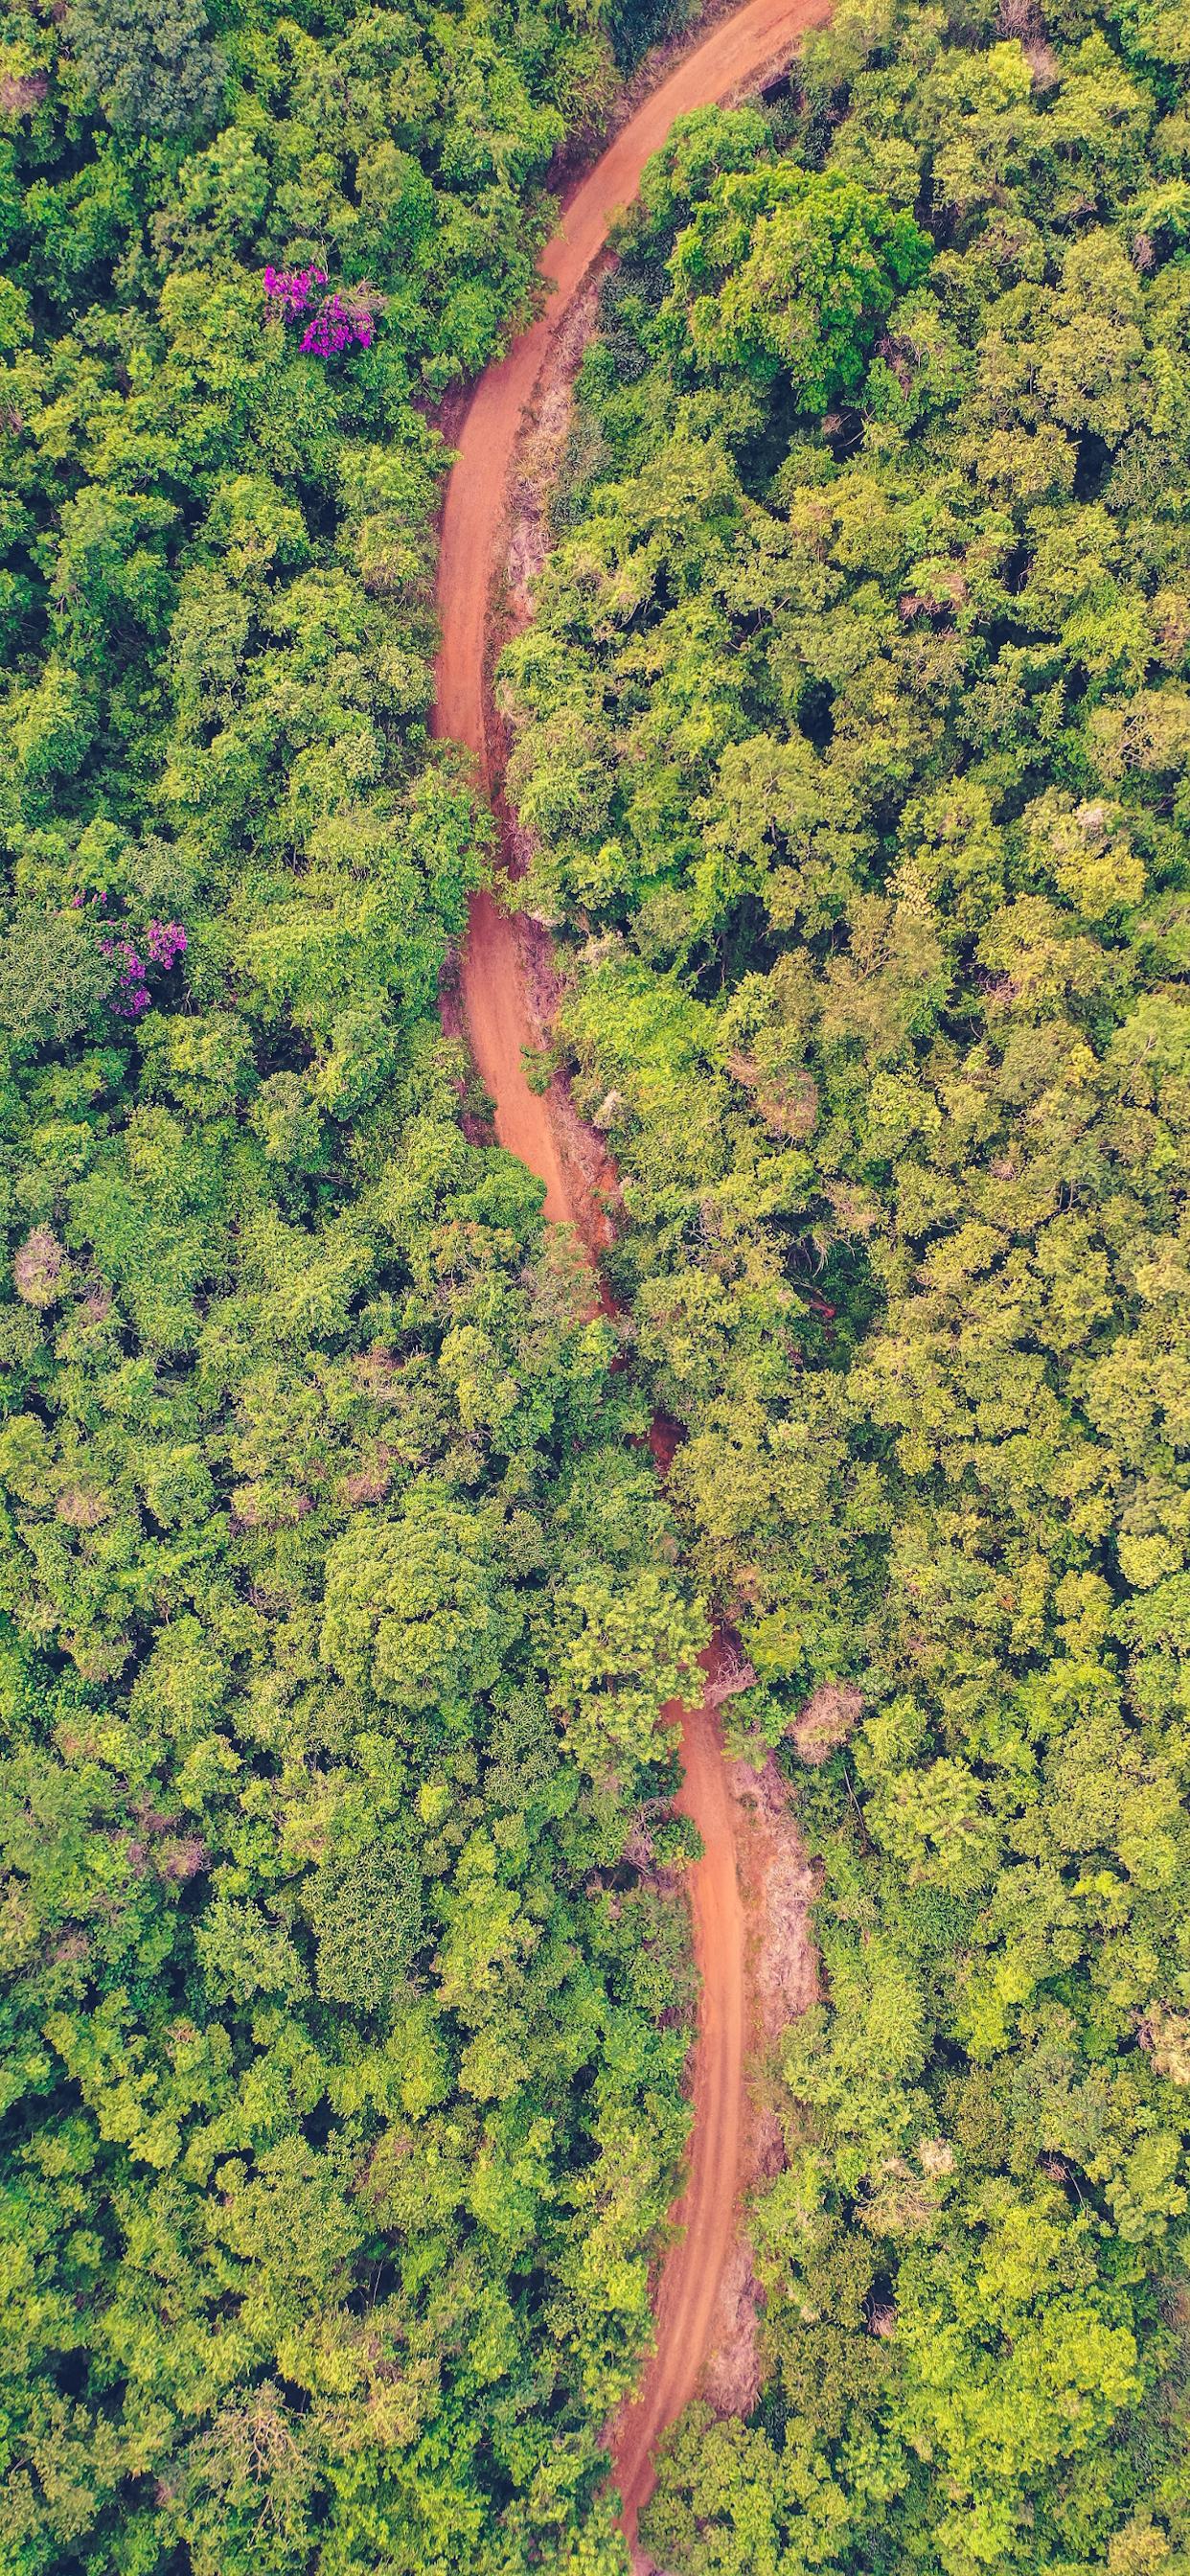 iPhone wallpapers road forest aerial Fonds d'écran iPhone du 10/03/2020